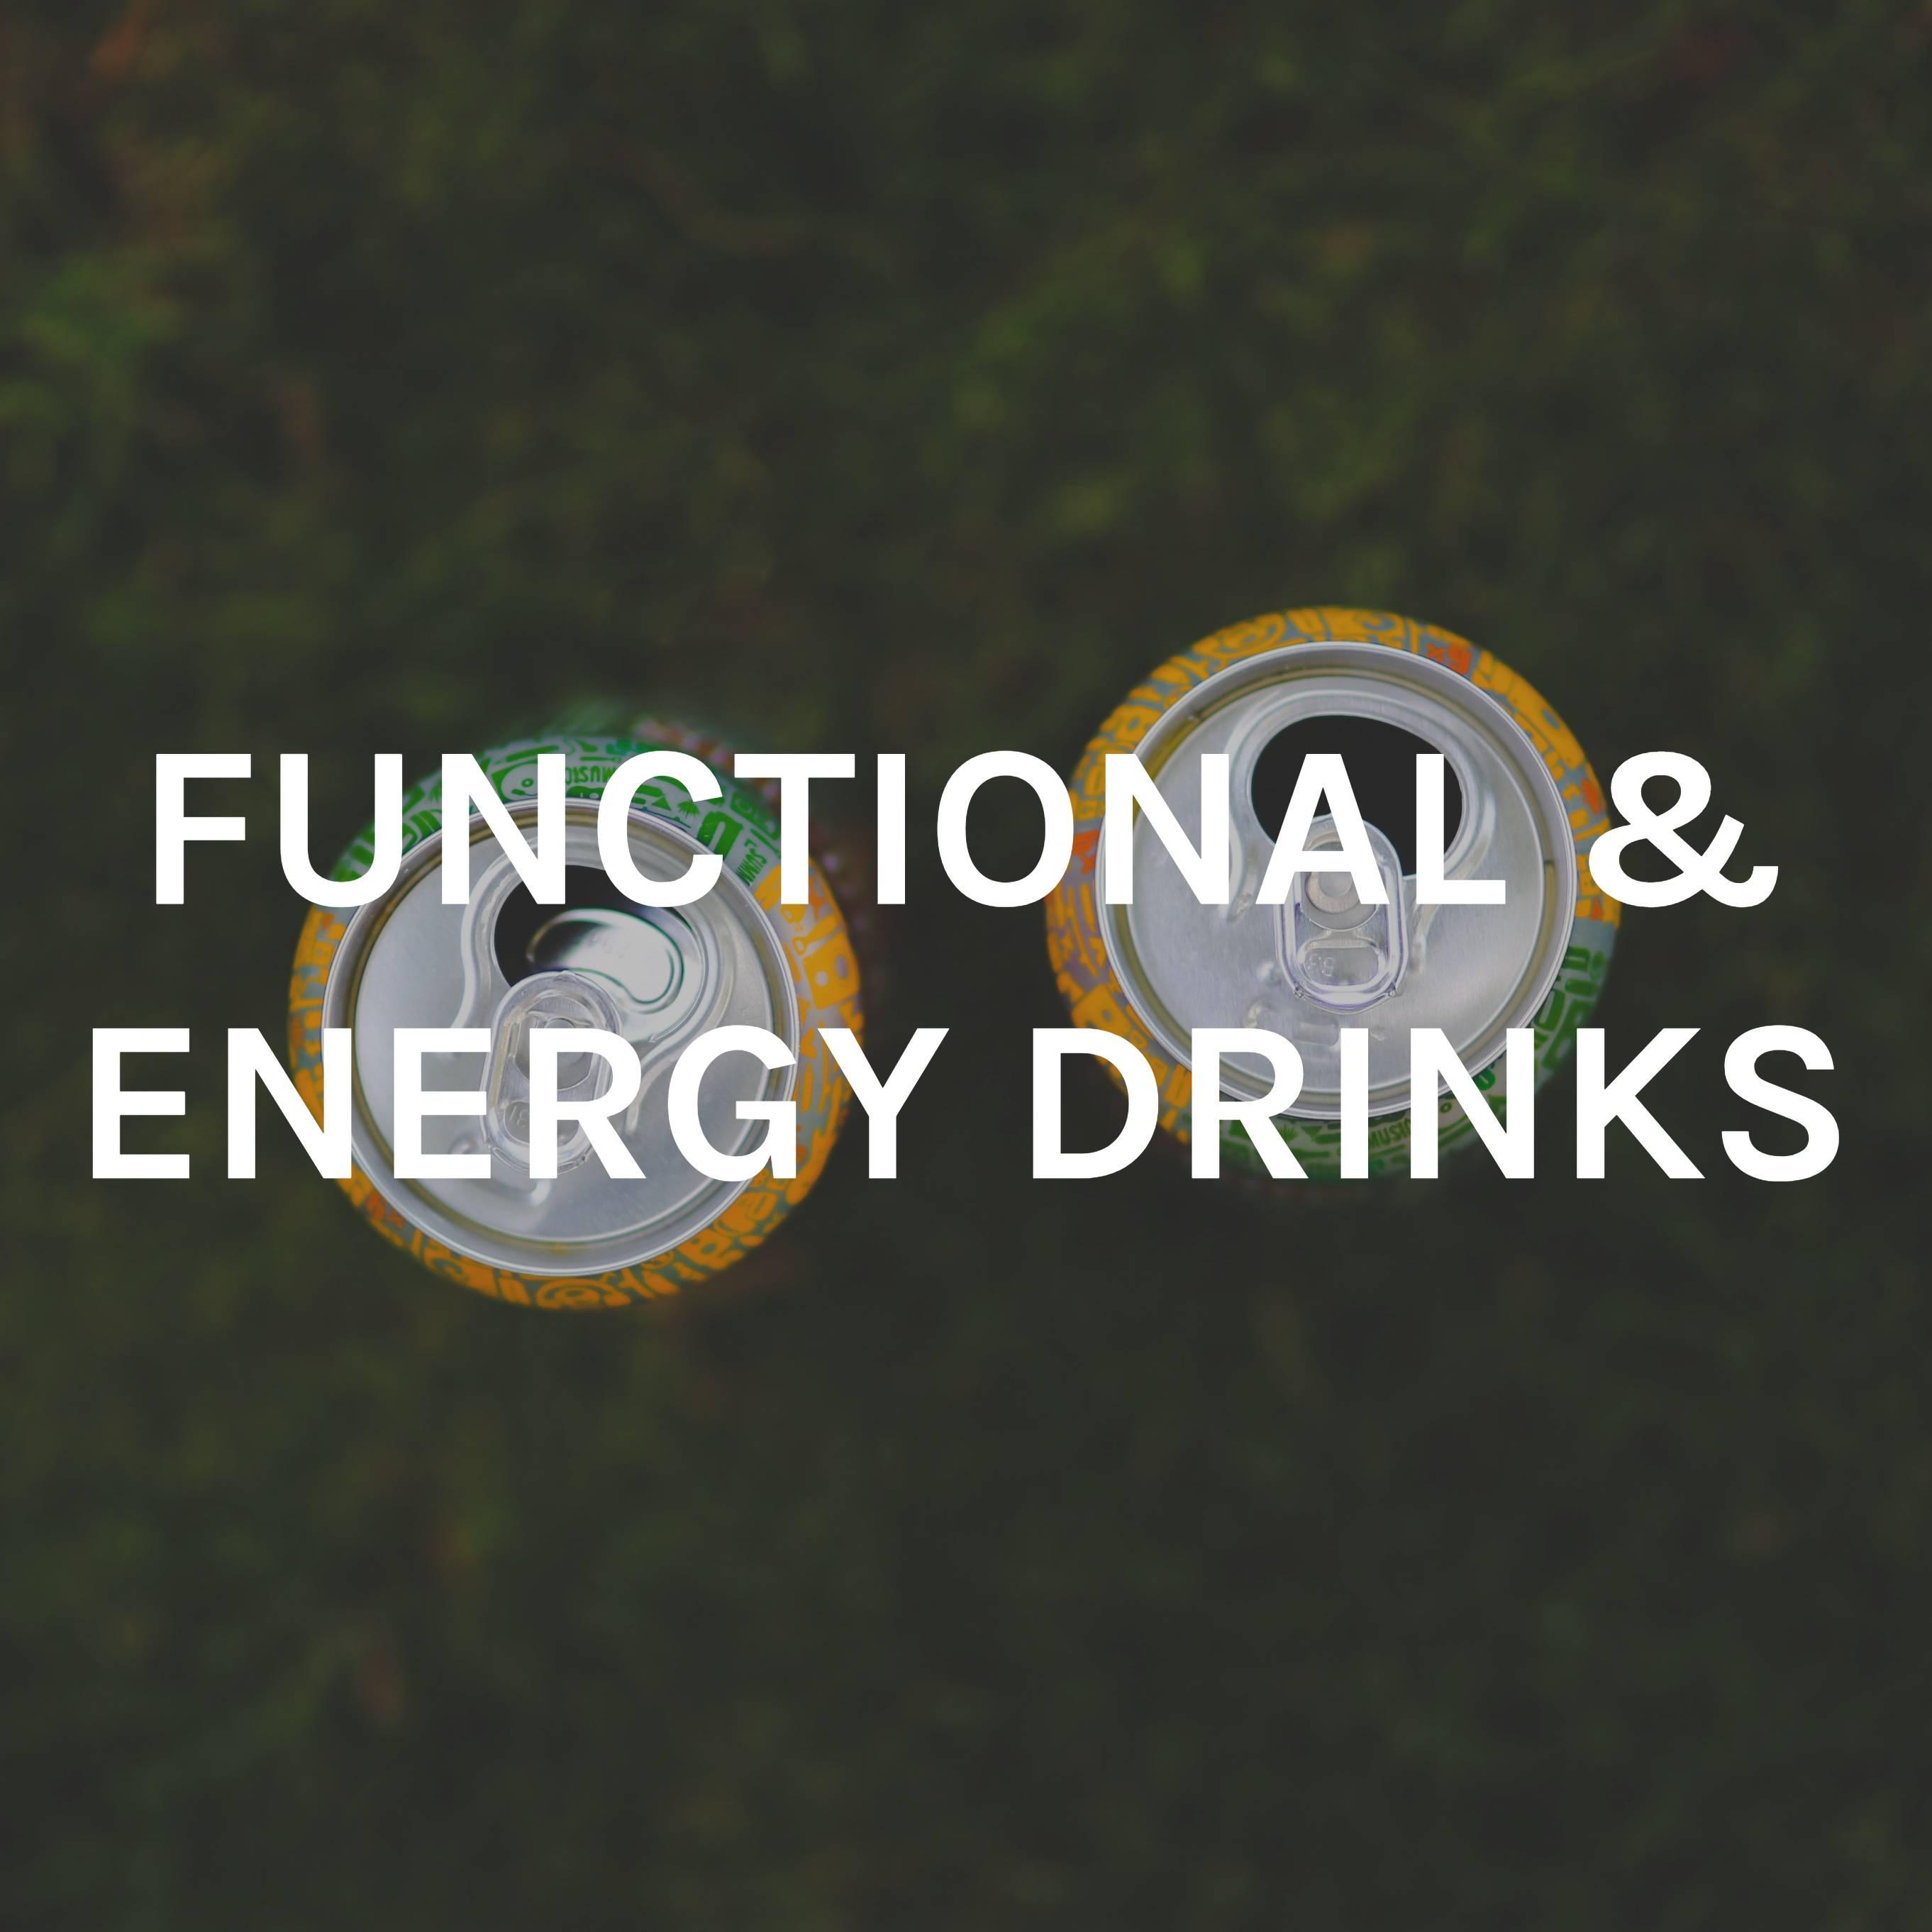 Function & Energy Drinks